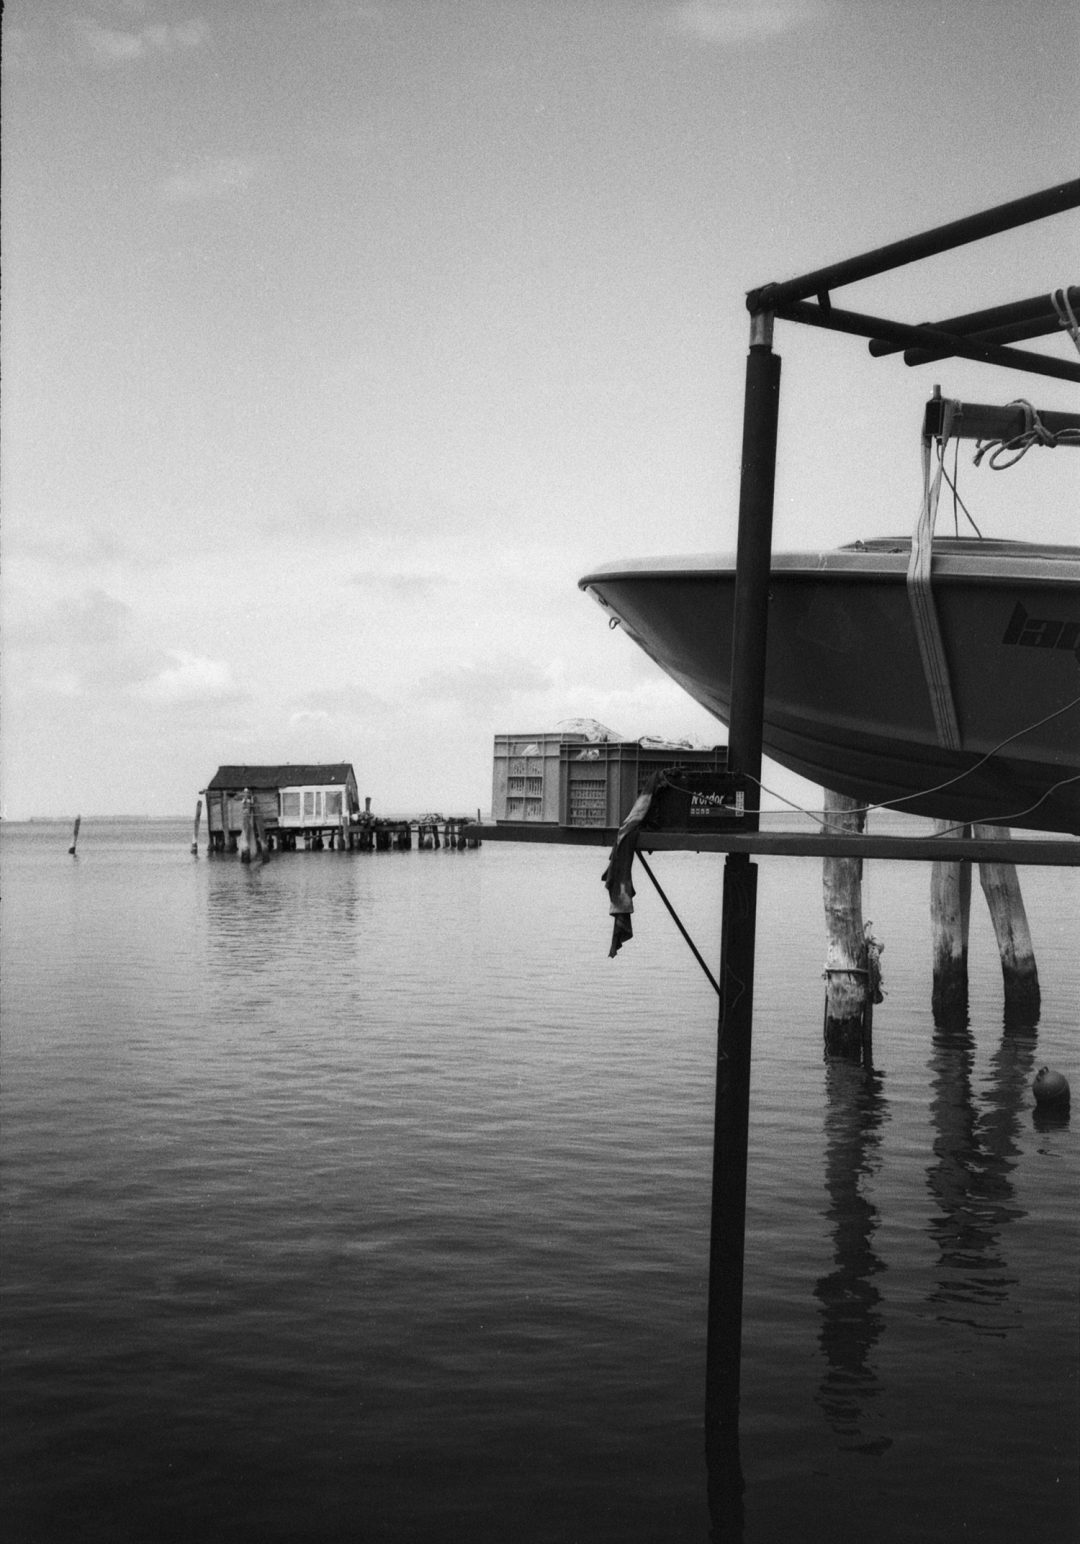 #137 Boat and Crates, Pellestrina, Italy